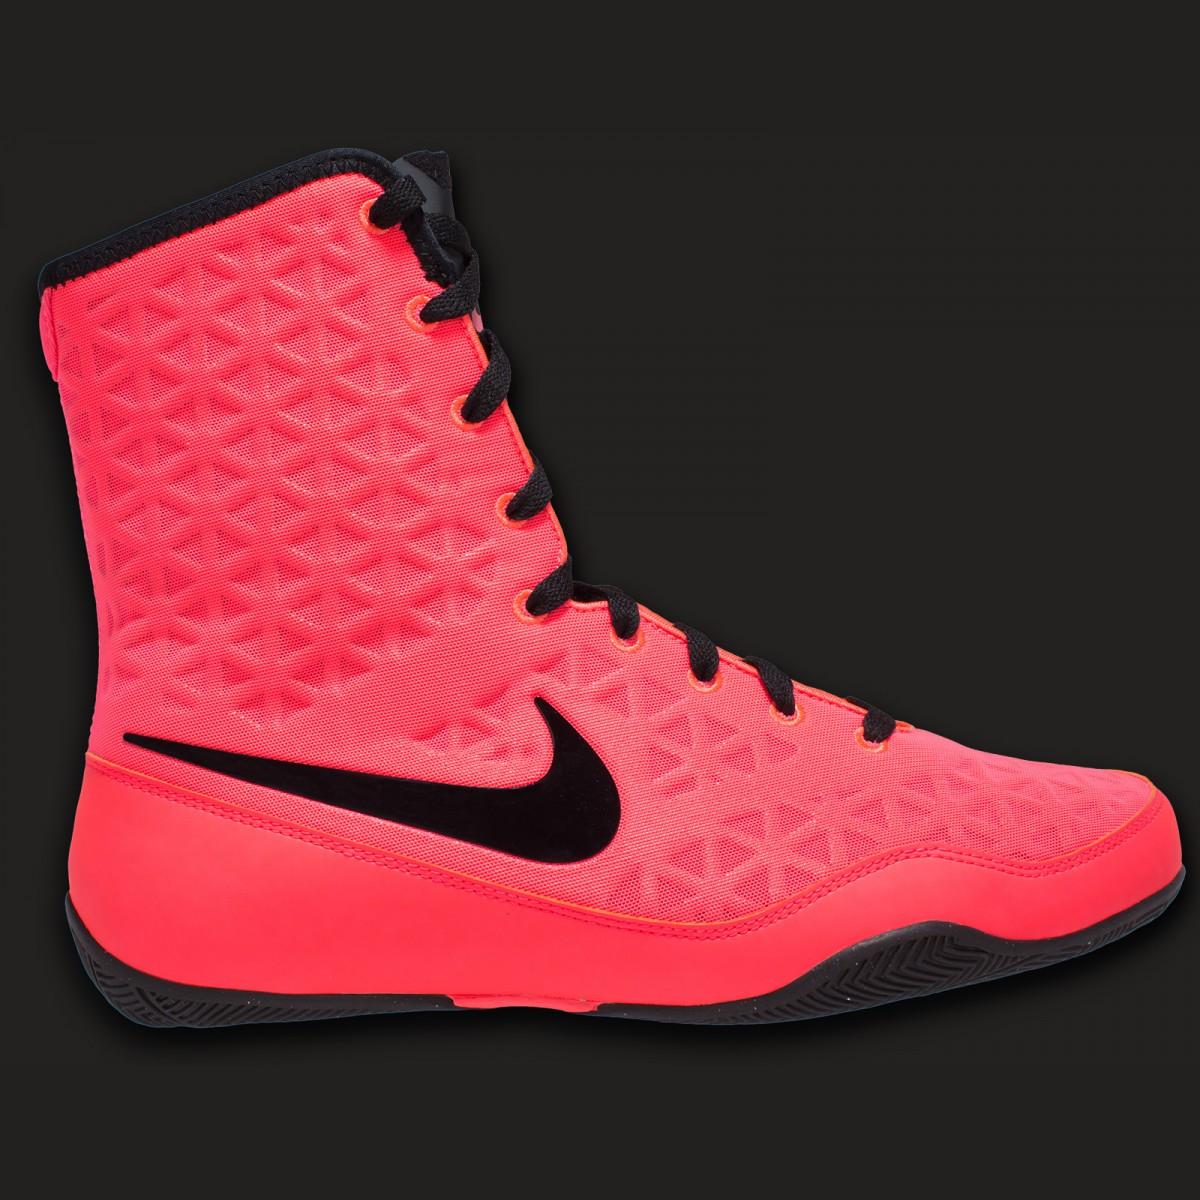 super popular 84a11 029c9 Nike KO Boxschuh Hyper Punch black ...